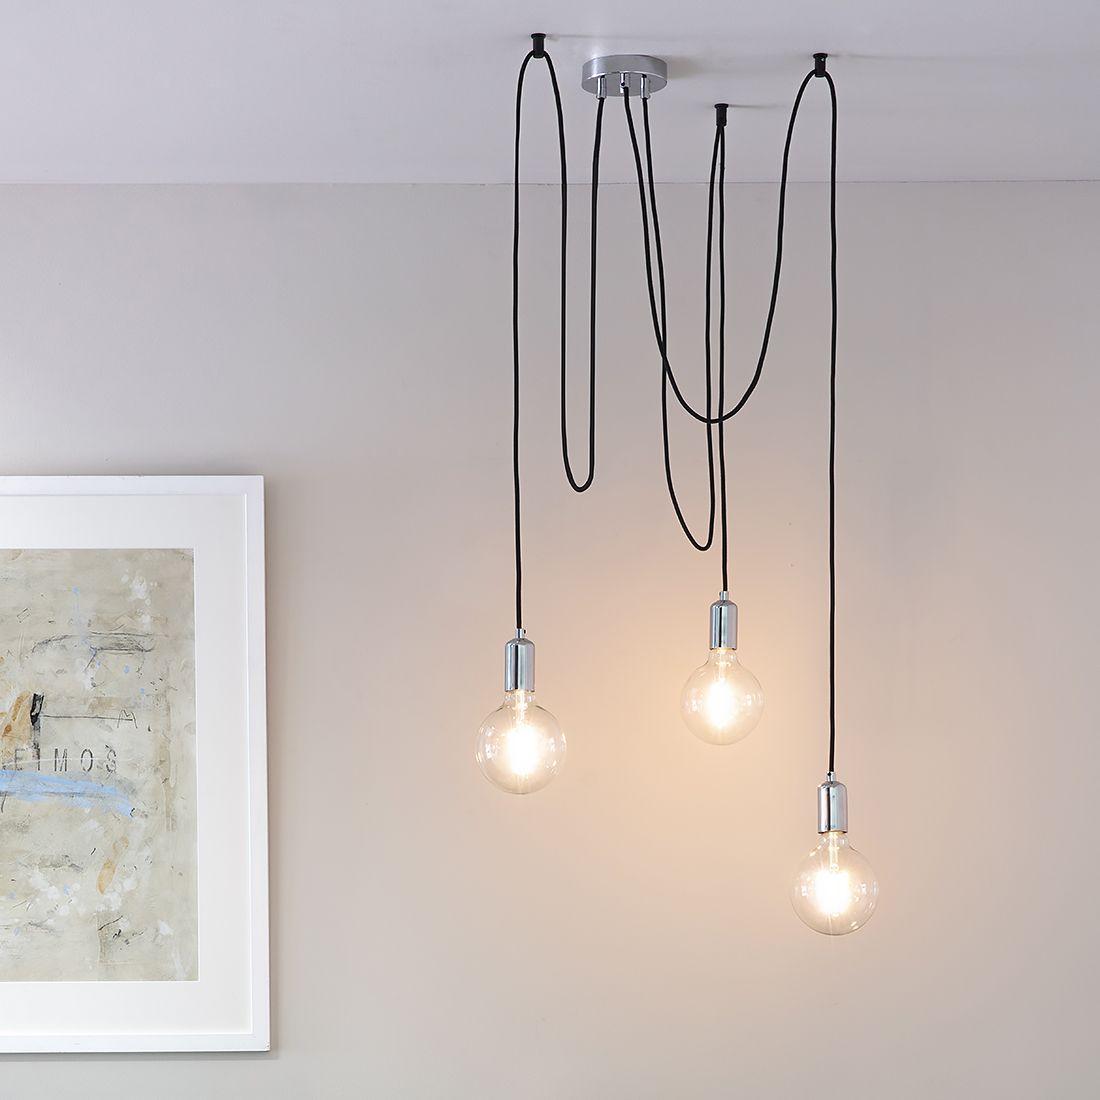 Cleo Three Bulb Industrial Pendant Light Copper Or Chrome Primrose Plum Industrial Pendant Lights Industrial Pendant Industrial Kitchen Lighting 3 bulb pendant light